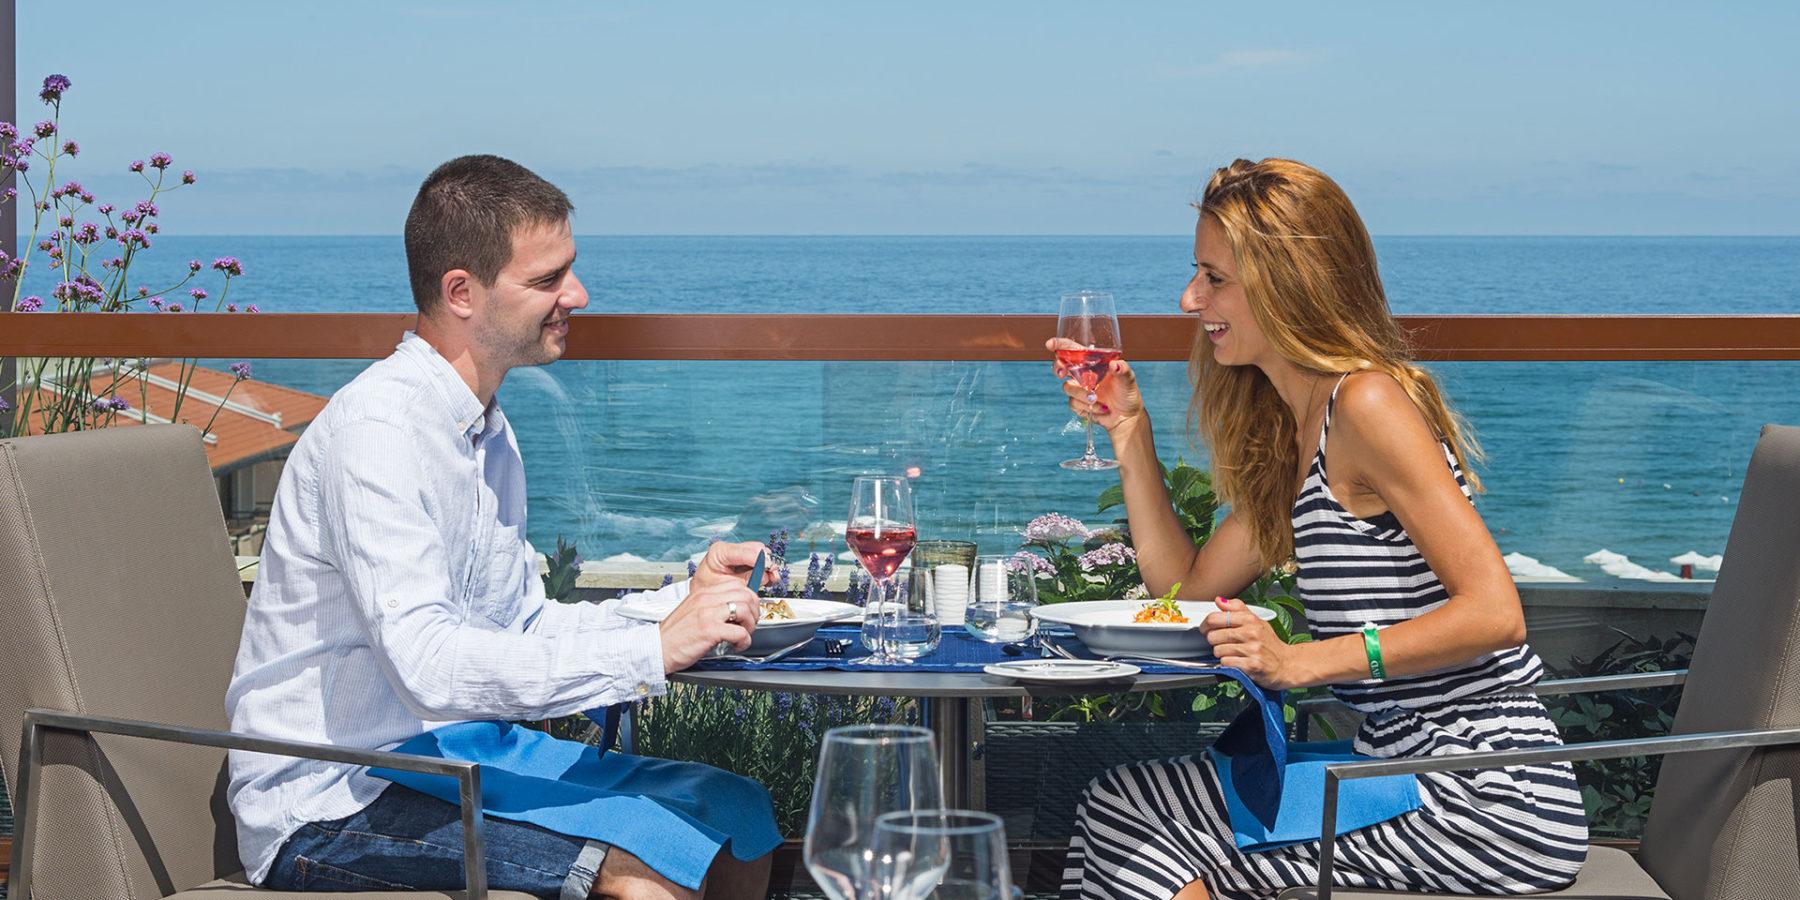 Restaurants HVD Clubhotel Miramar